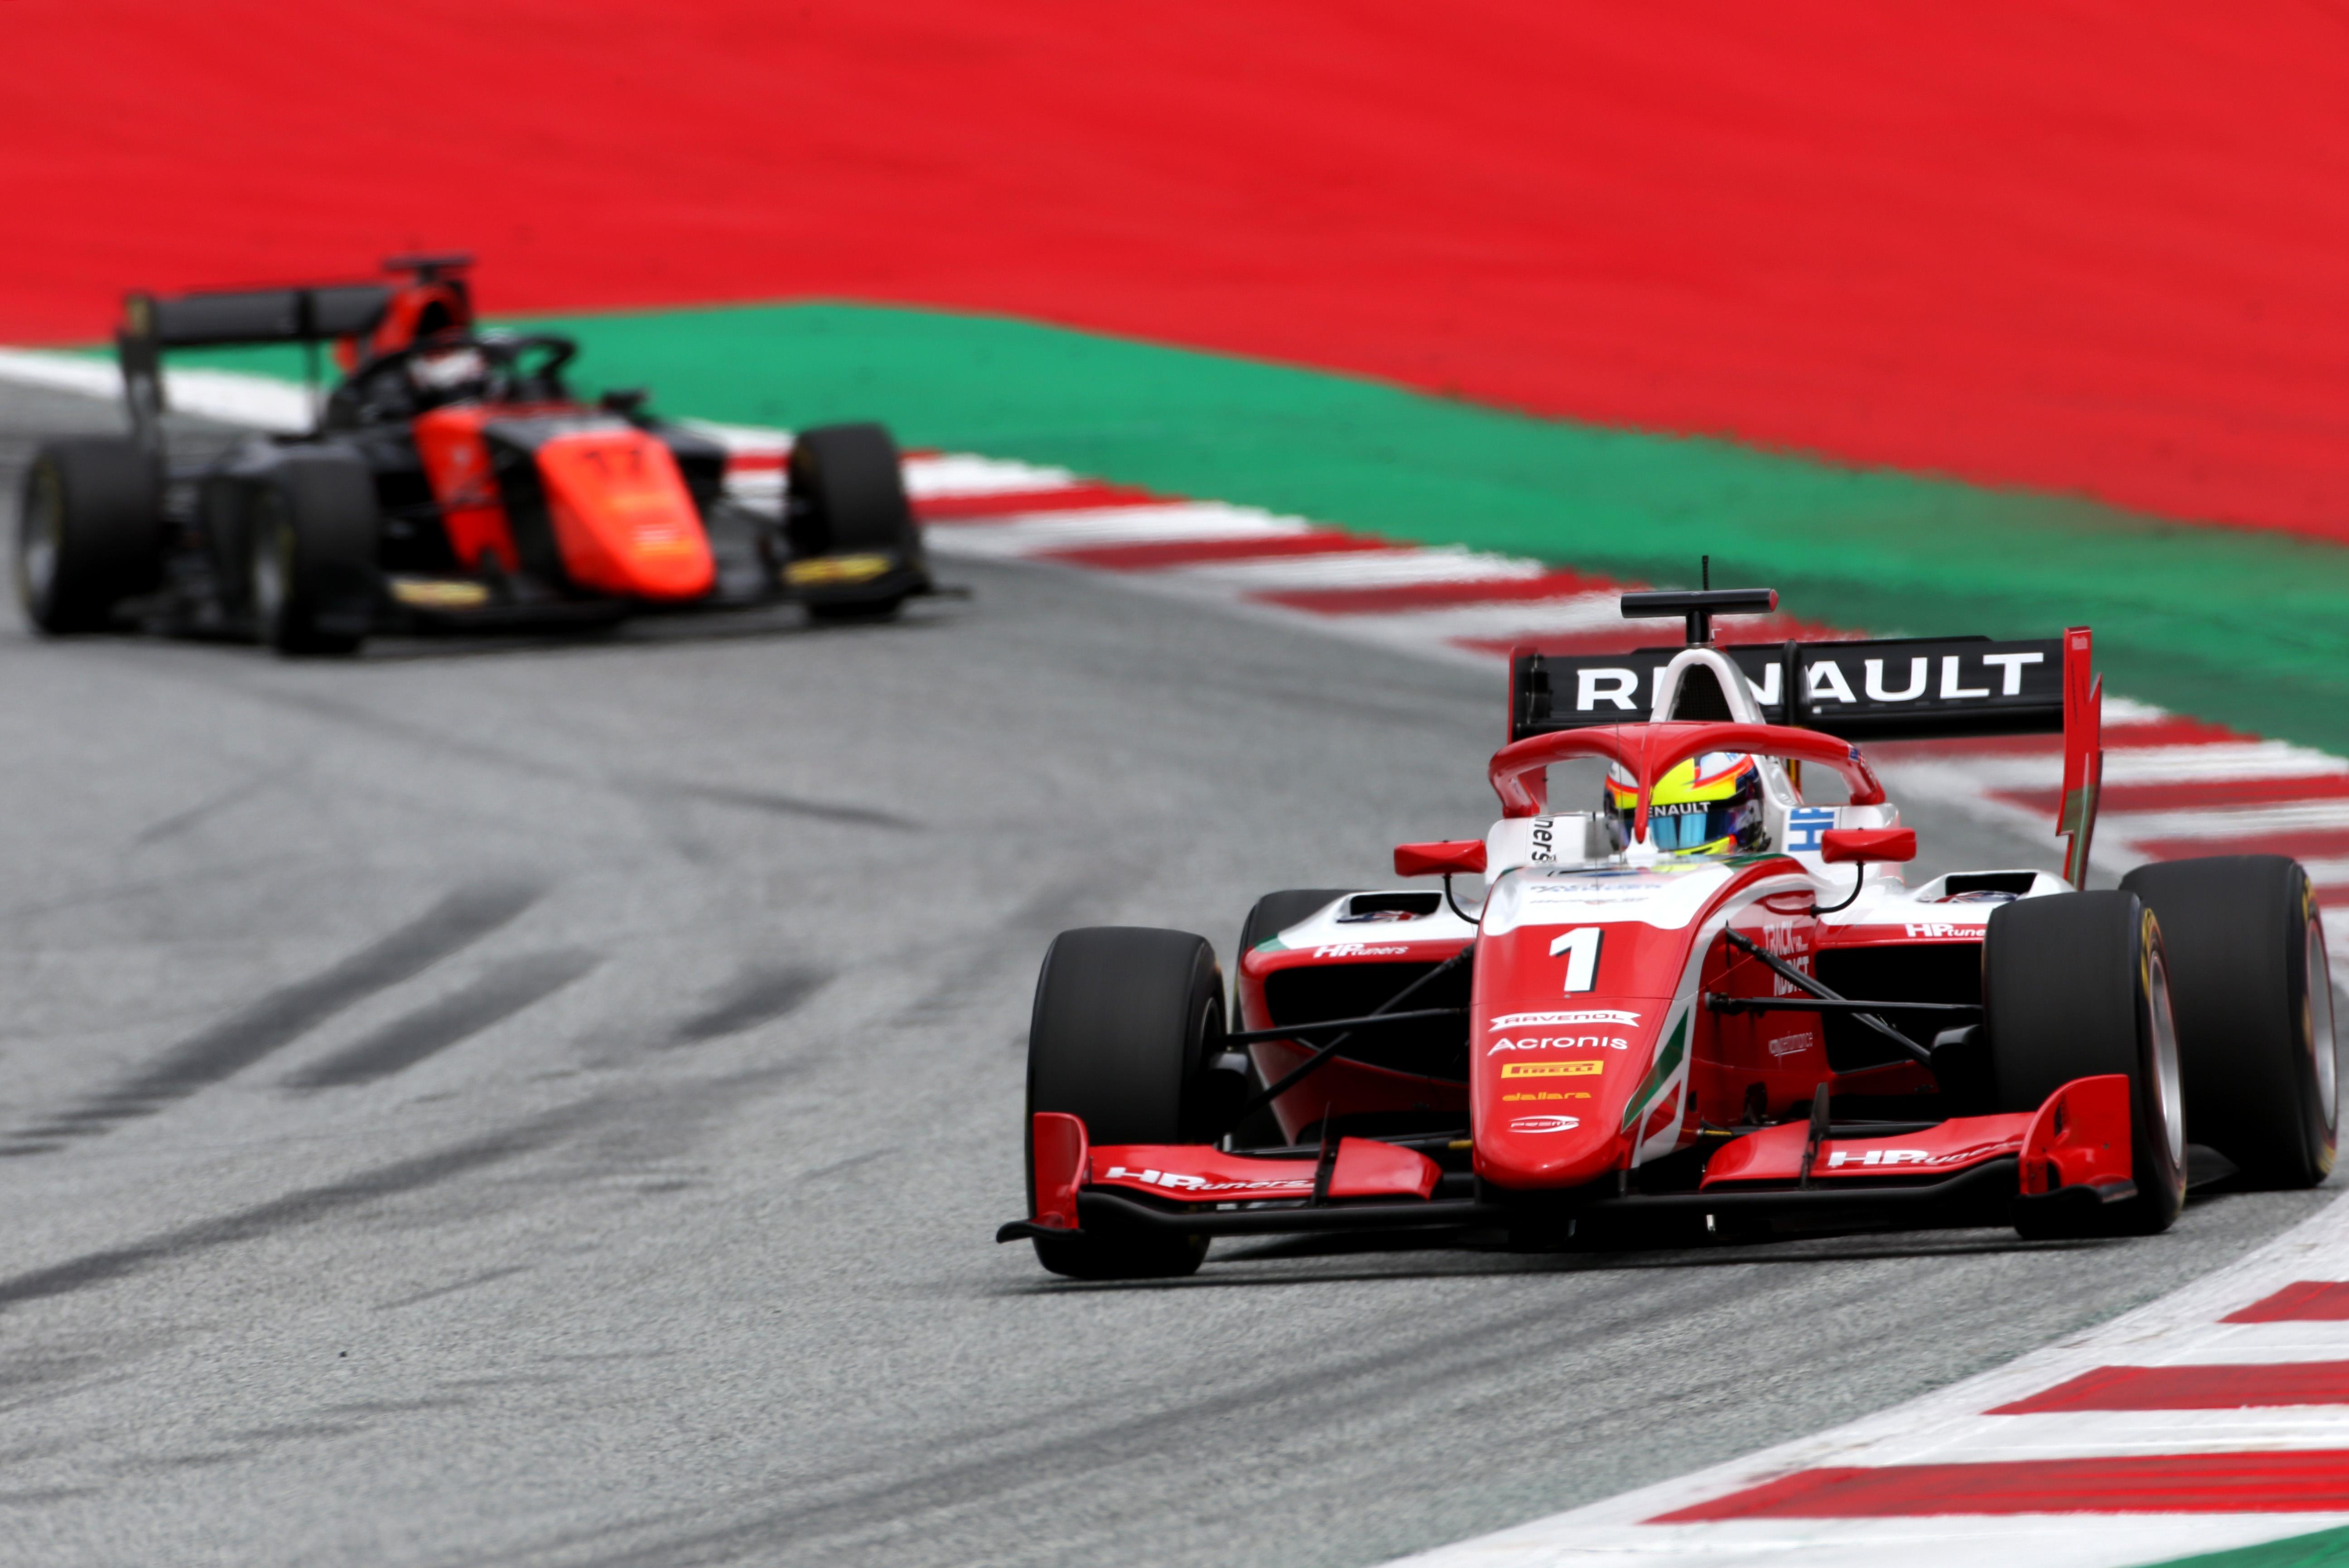 Motor Racing Fia Formula 3 Championship Friday Spielberg, Austria